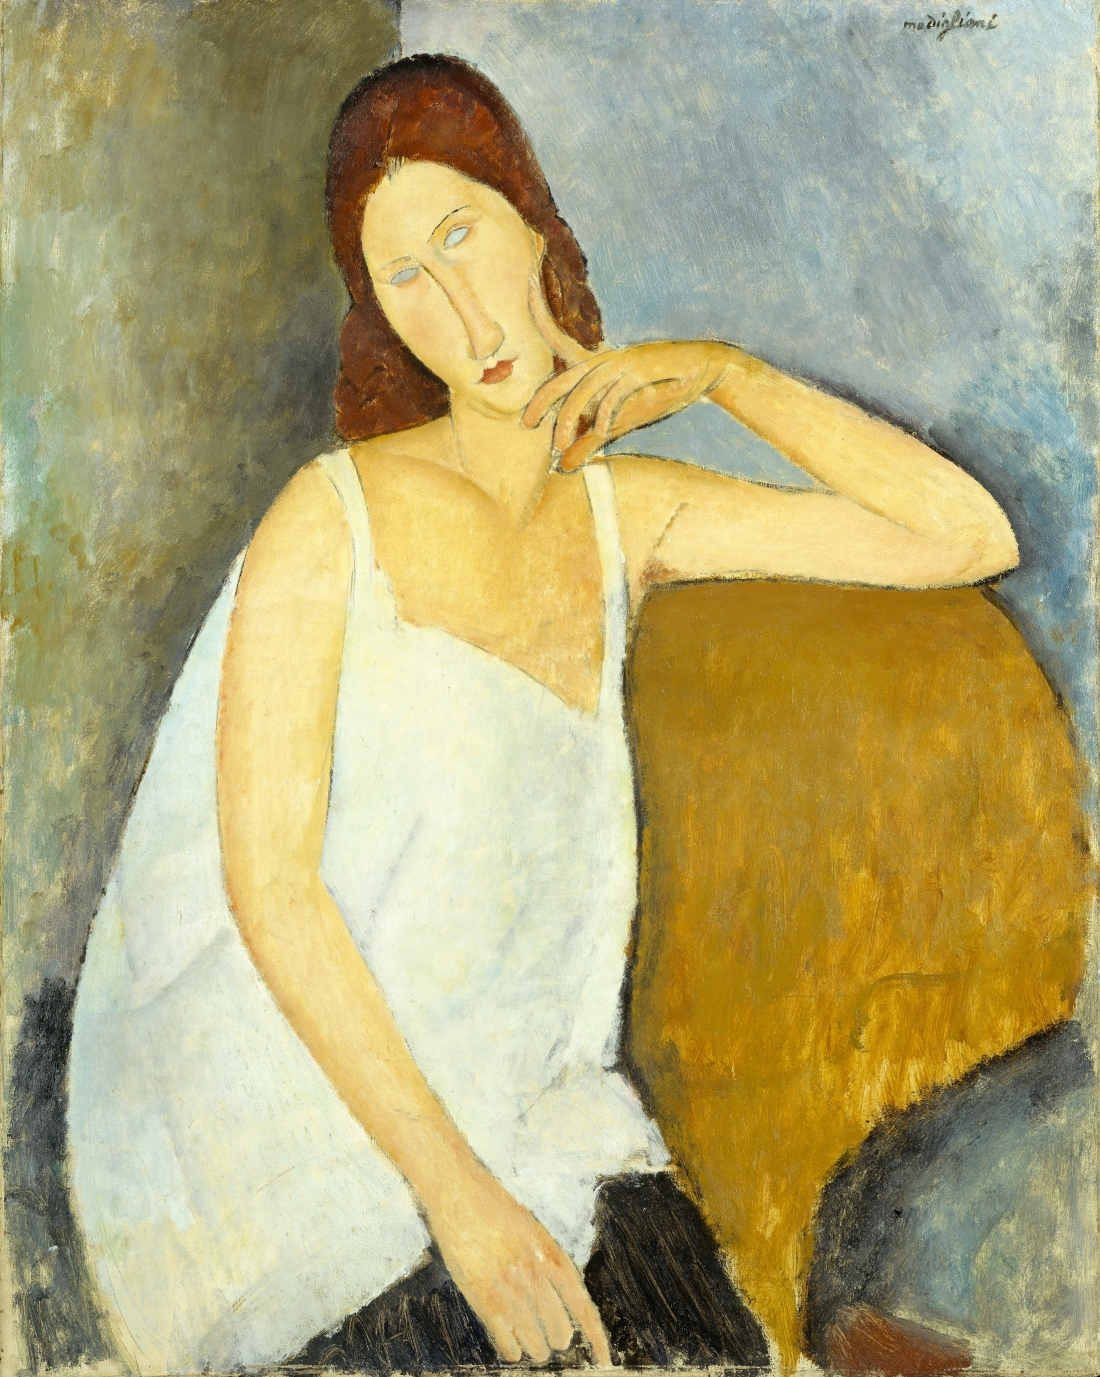 d8b9f40f65b Jeanne Hébuterne 1919 Medium Oil paint on canvas 914 x 730 mm The  Metropolitan Museum of Art